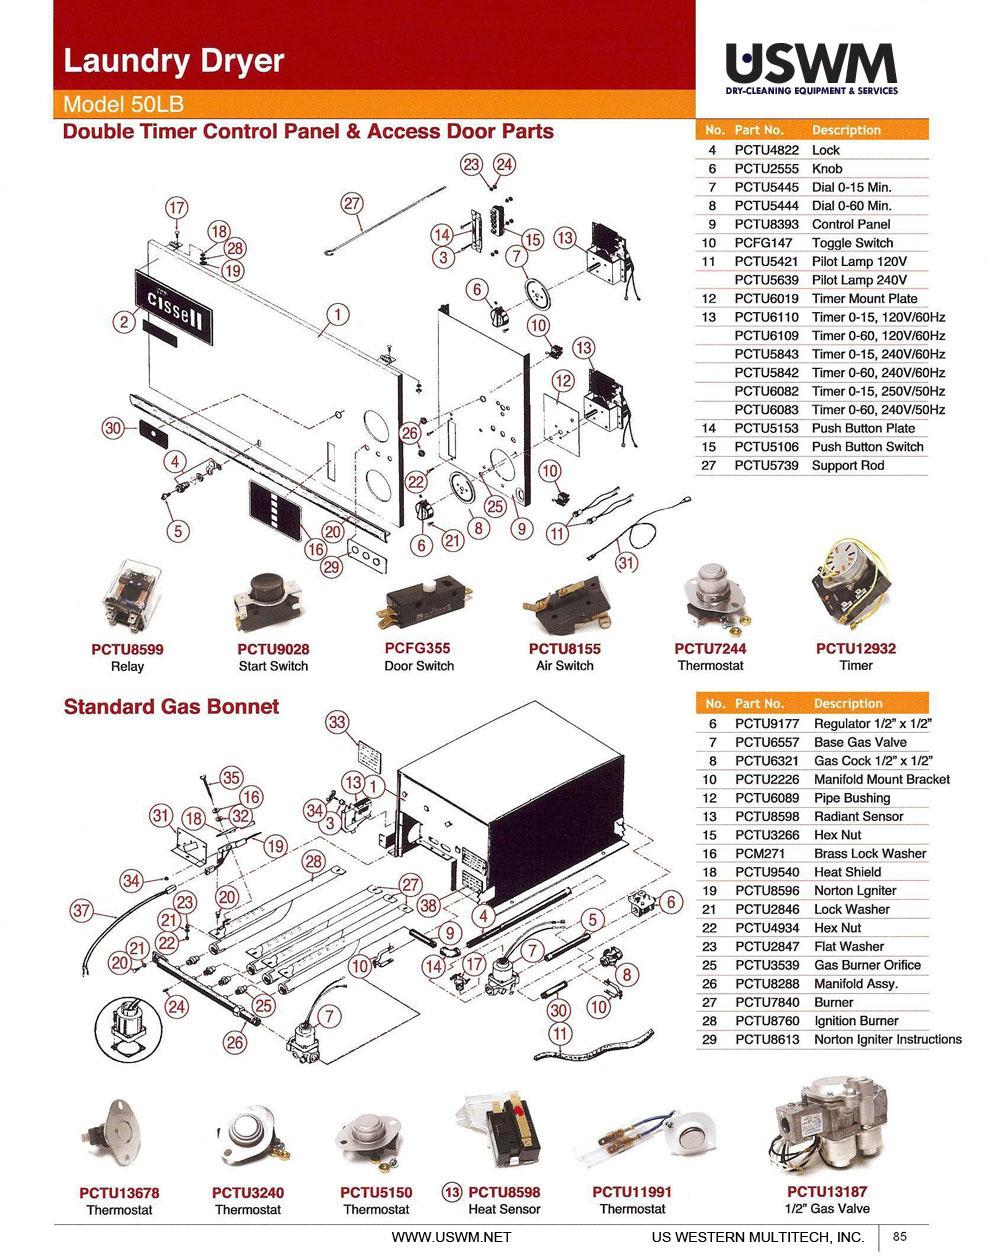 Sensational Cissell Dryer Wiring Diagrams Basic Electronics Wiring Diagram Wiring Cloud Gufailluminateatxorg